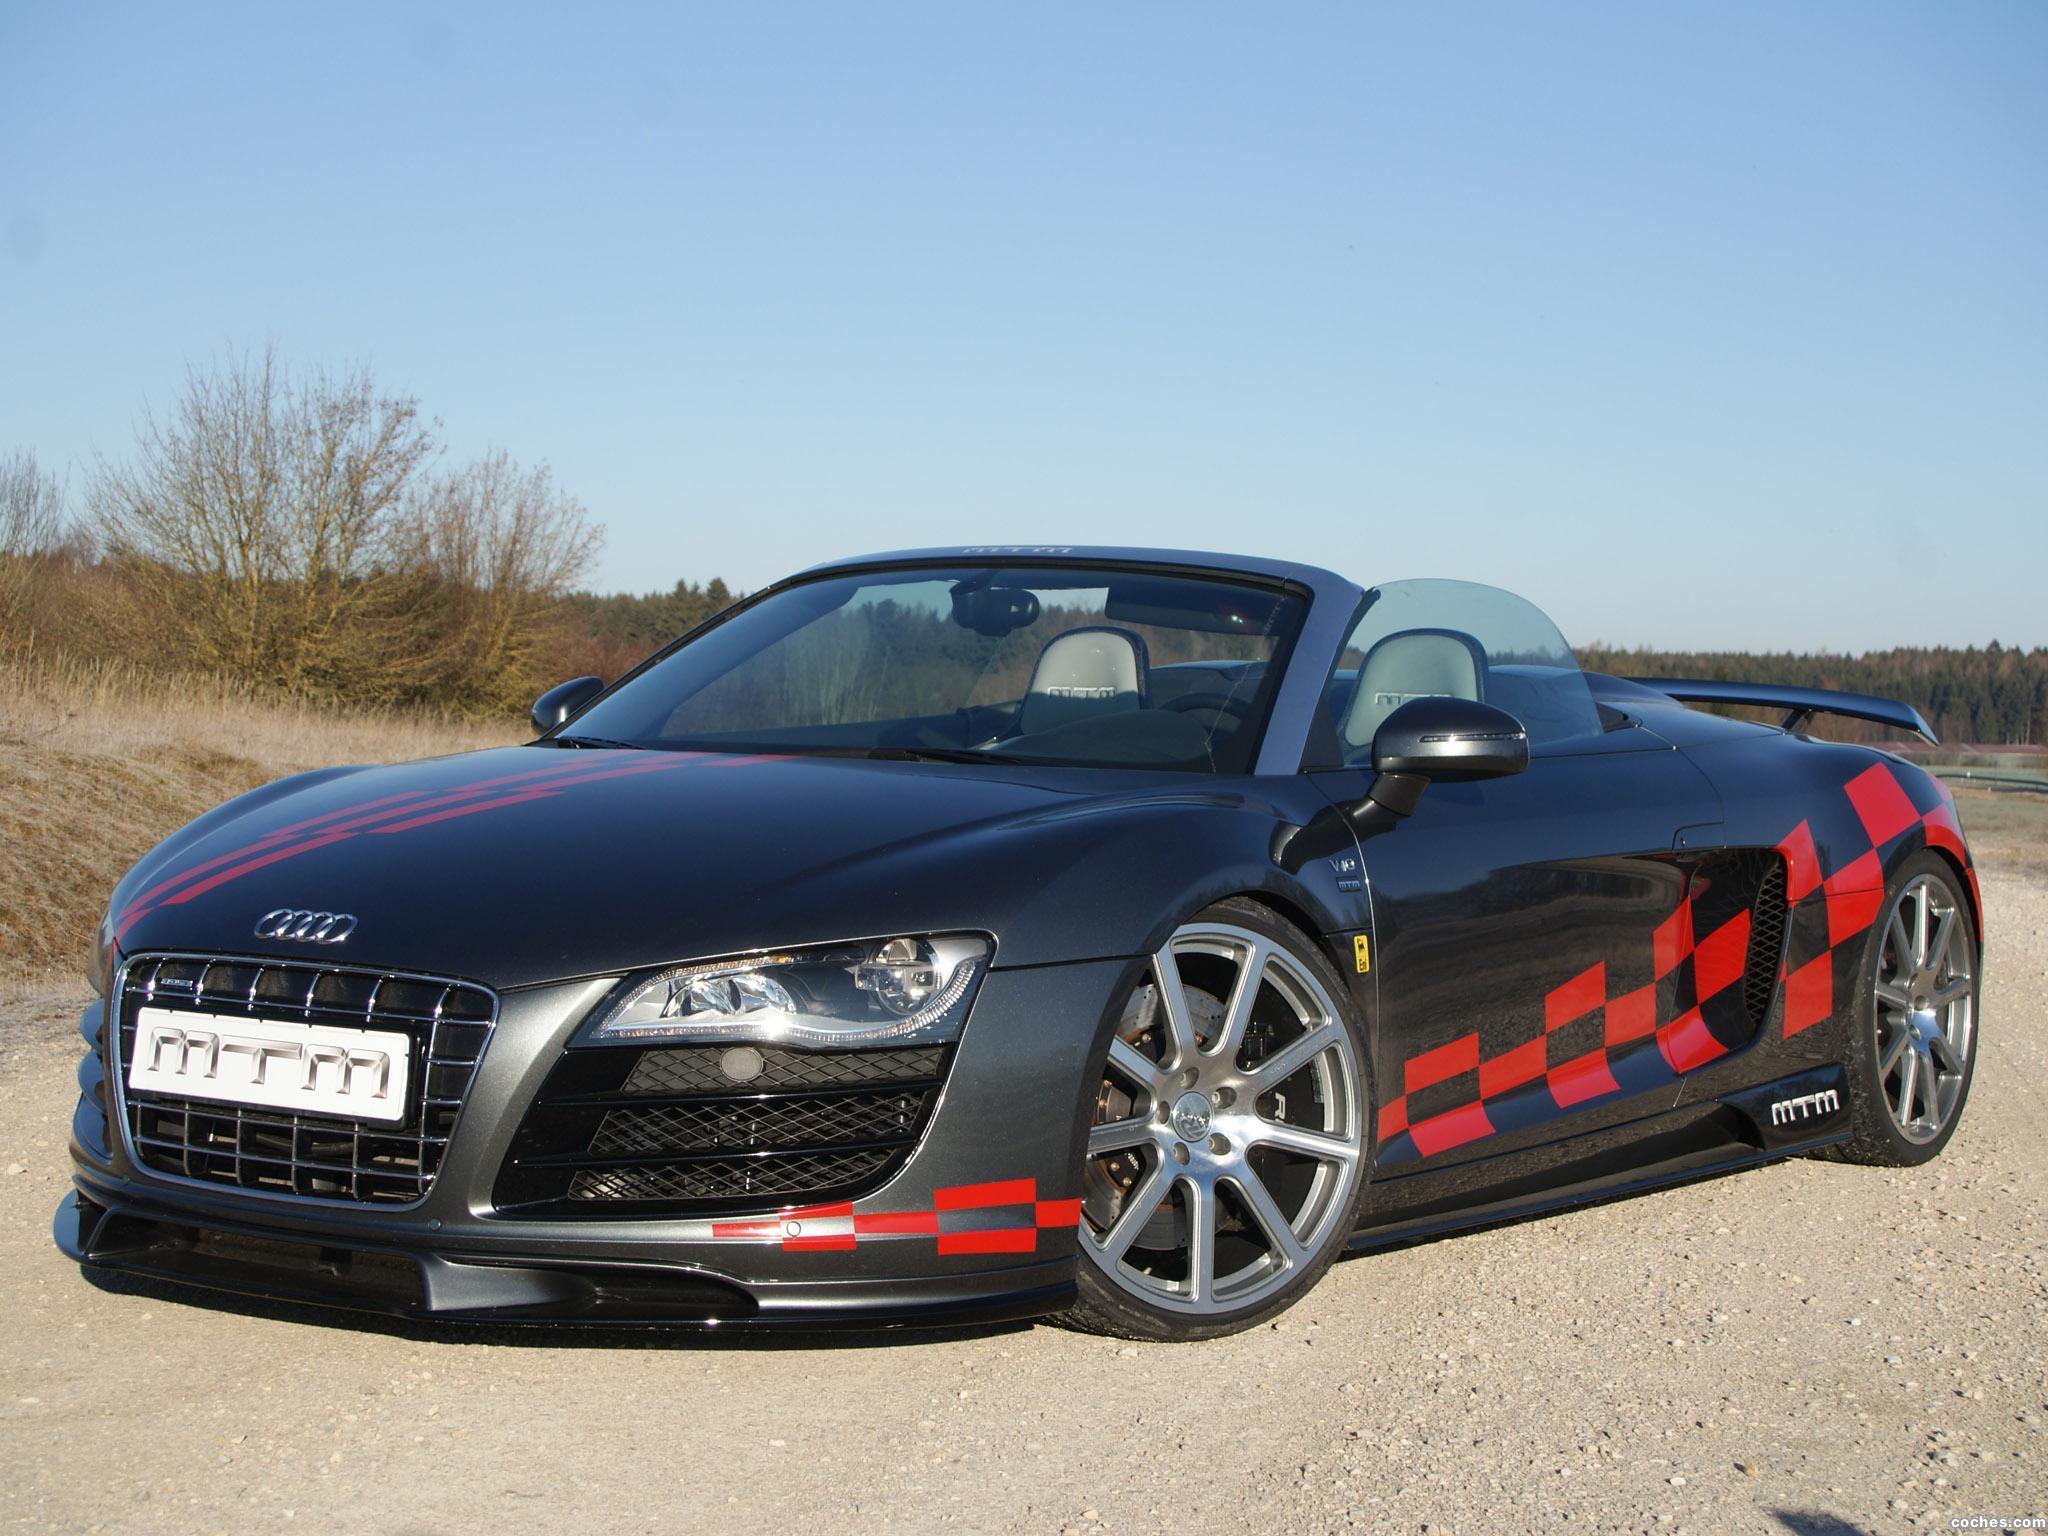 Foto 0 de Audi MTM R8 Spyder 2012